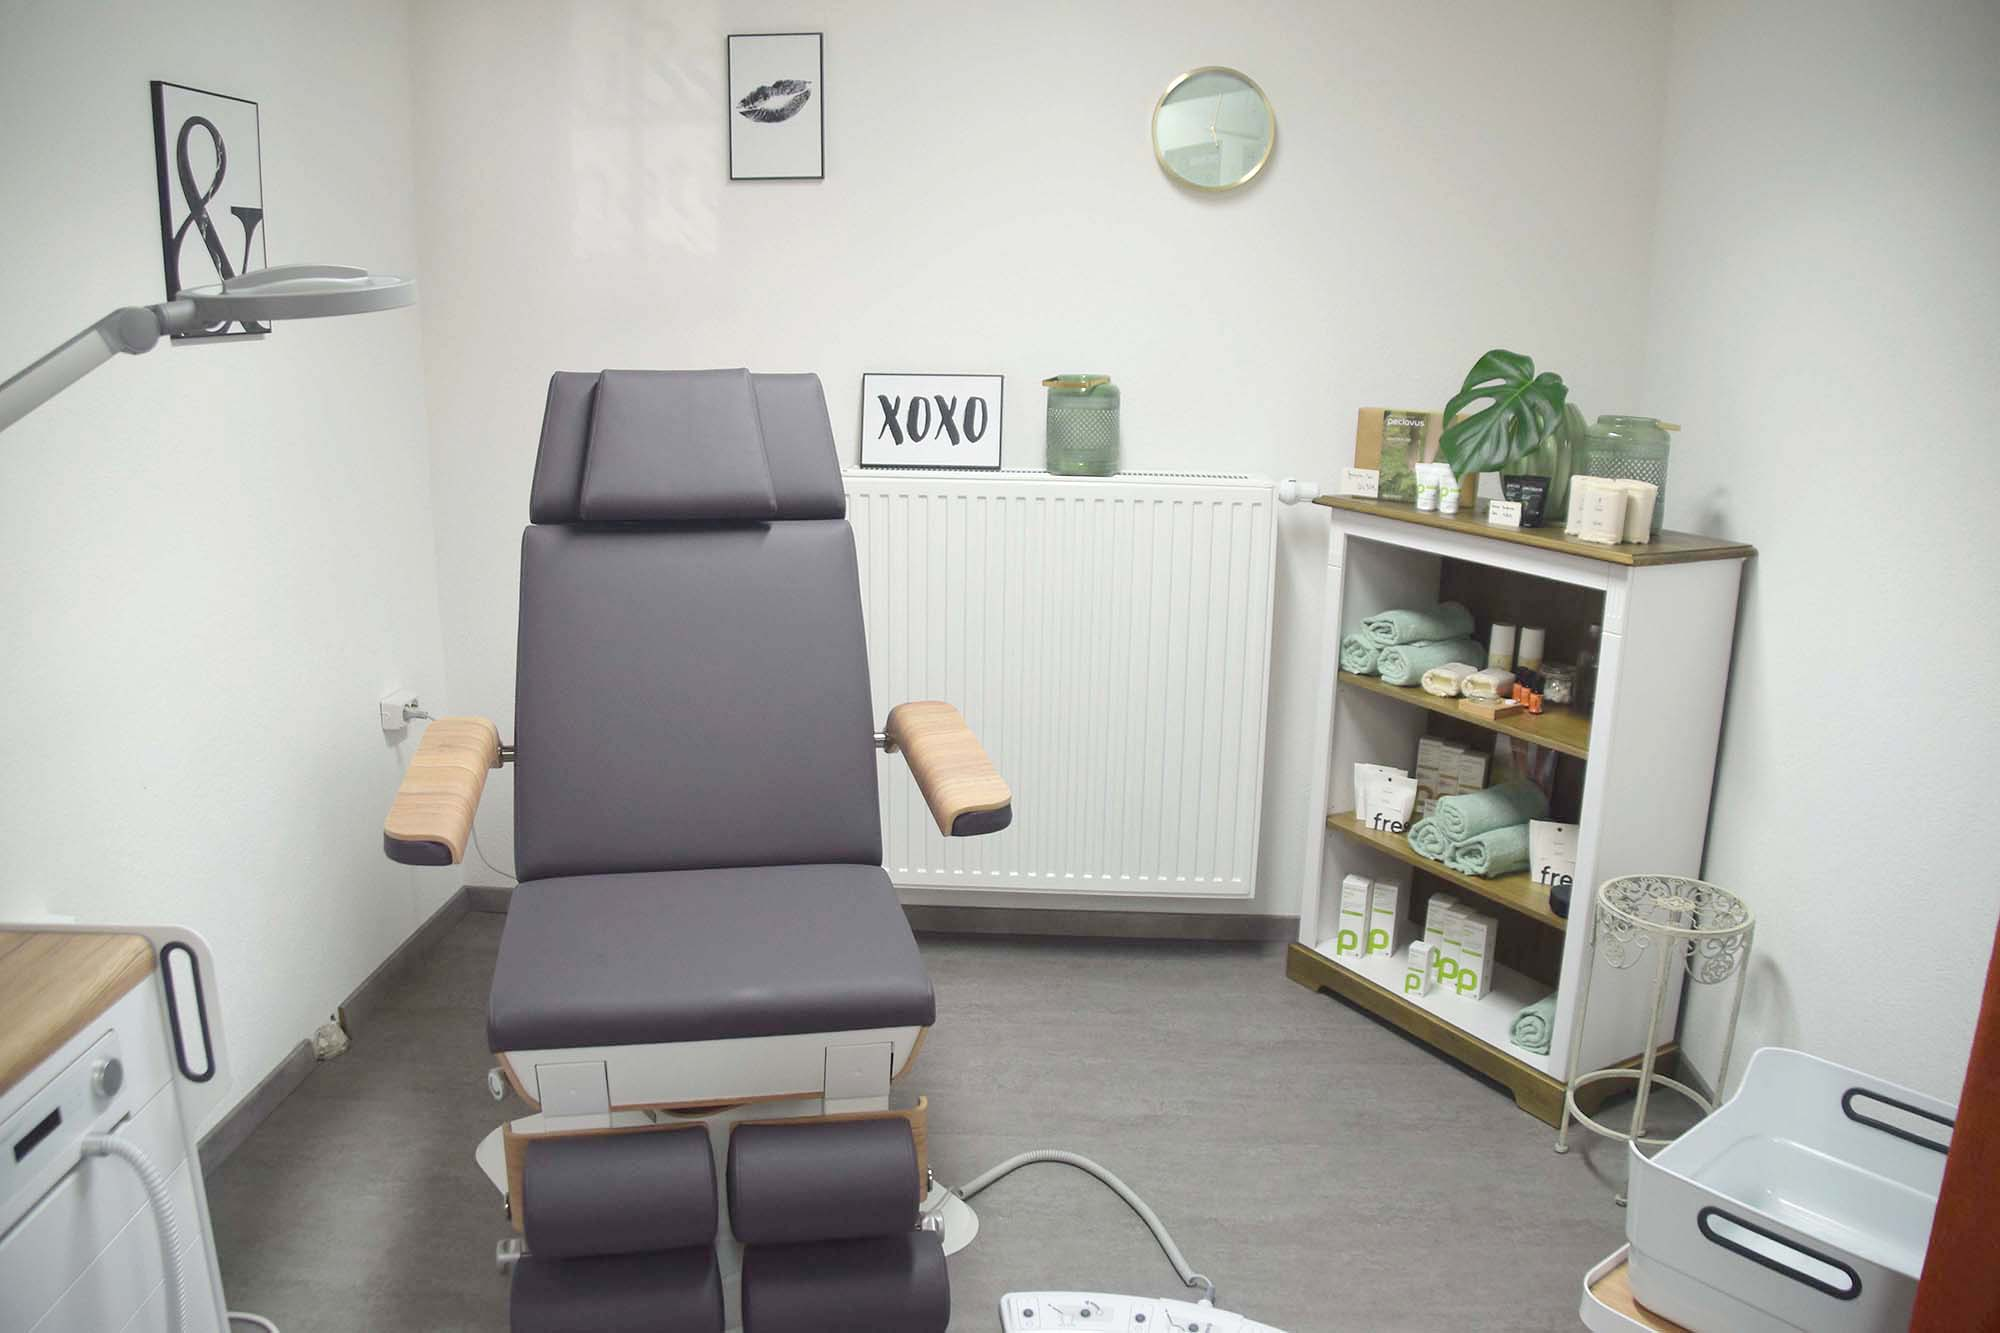 2021-9-1-NO-hv-Fusspflegepraxis Walter-Eröffnung-DSC_2042